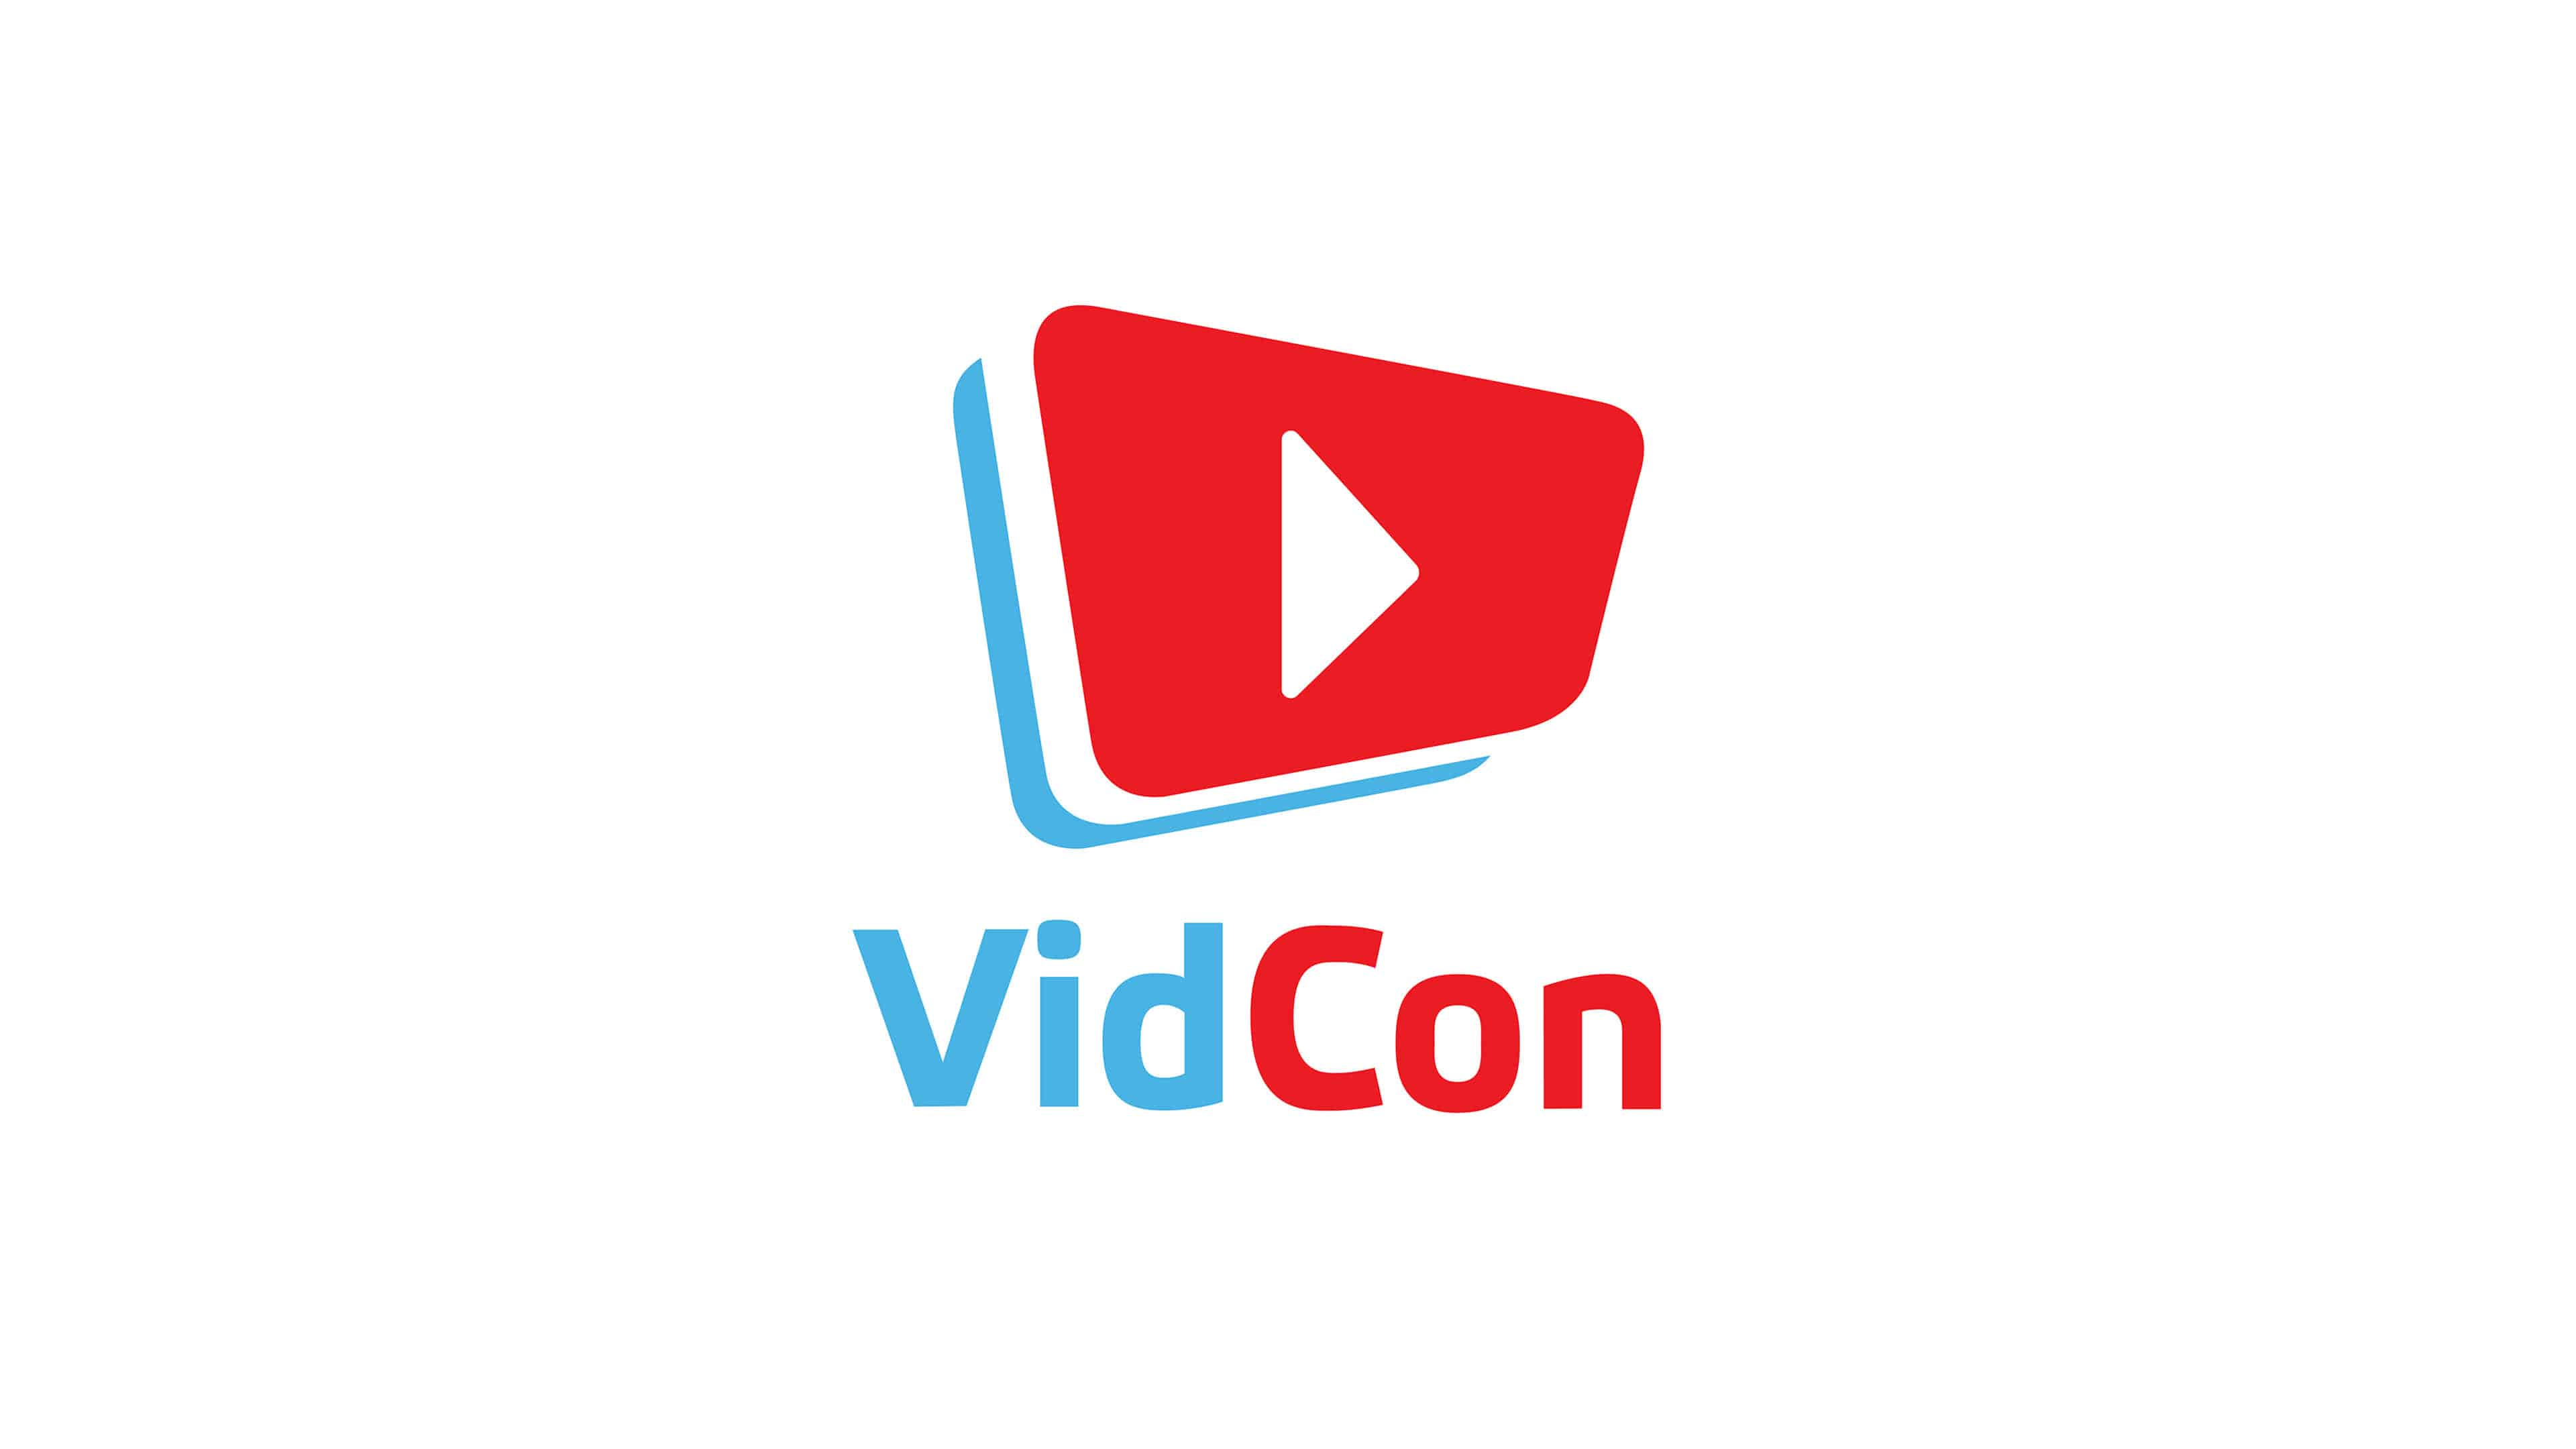 vidcon logo uhd 4k wallpaper